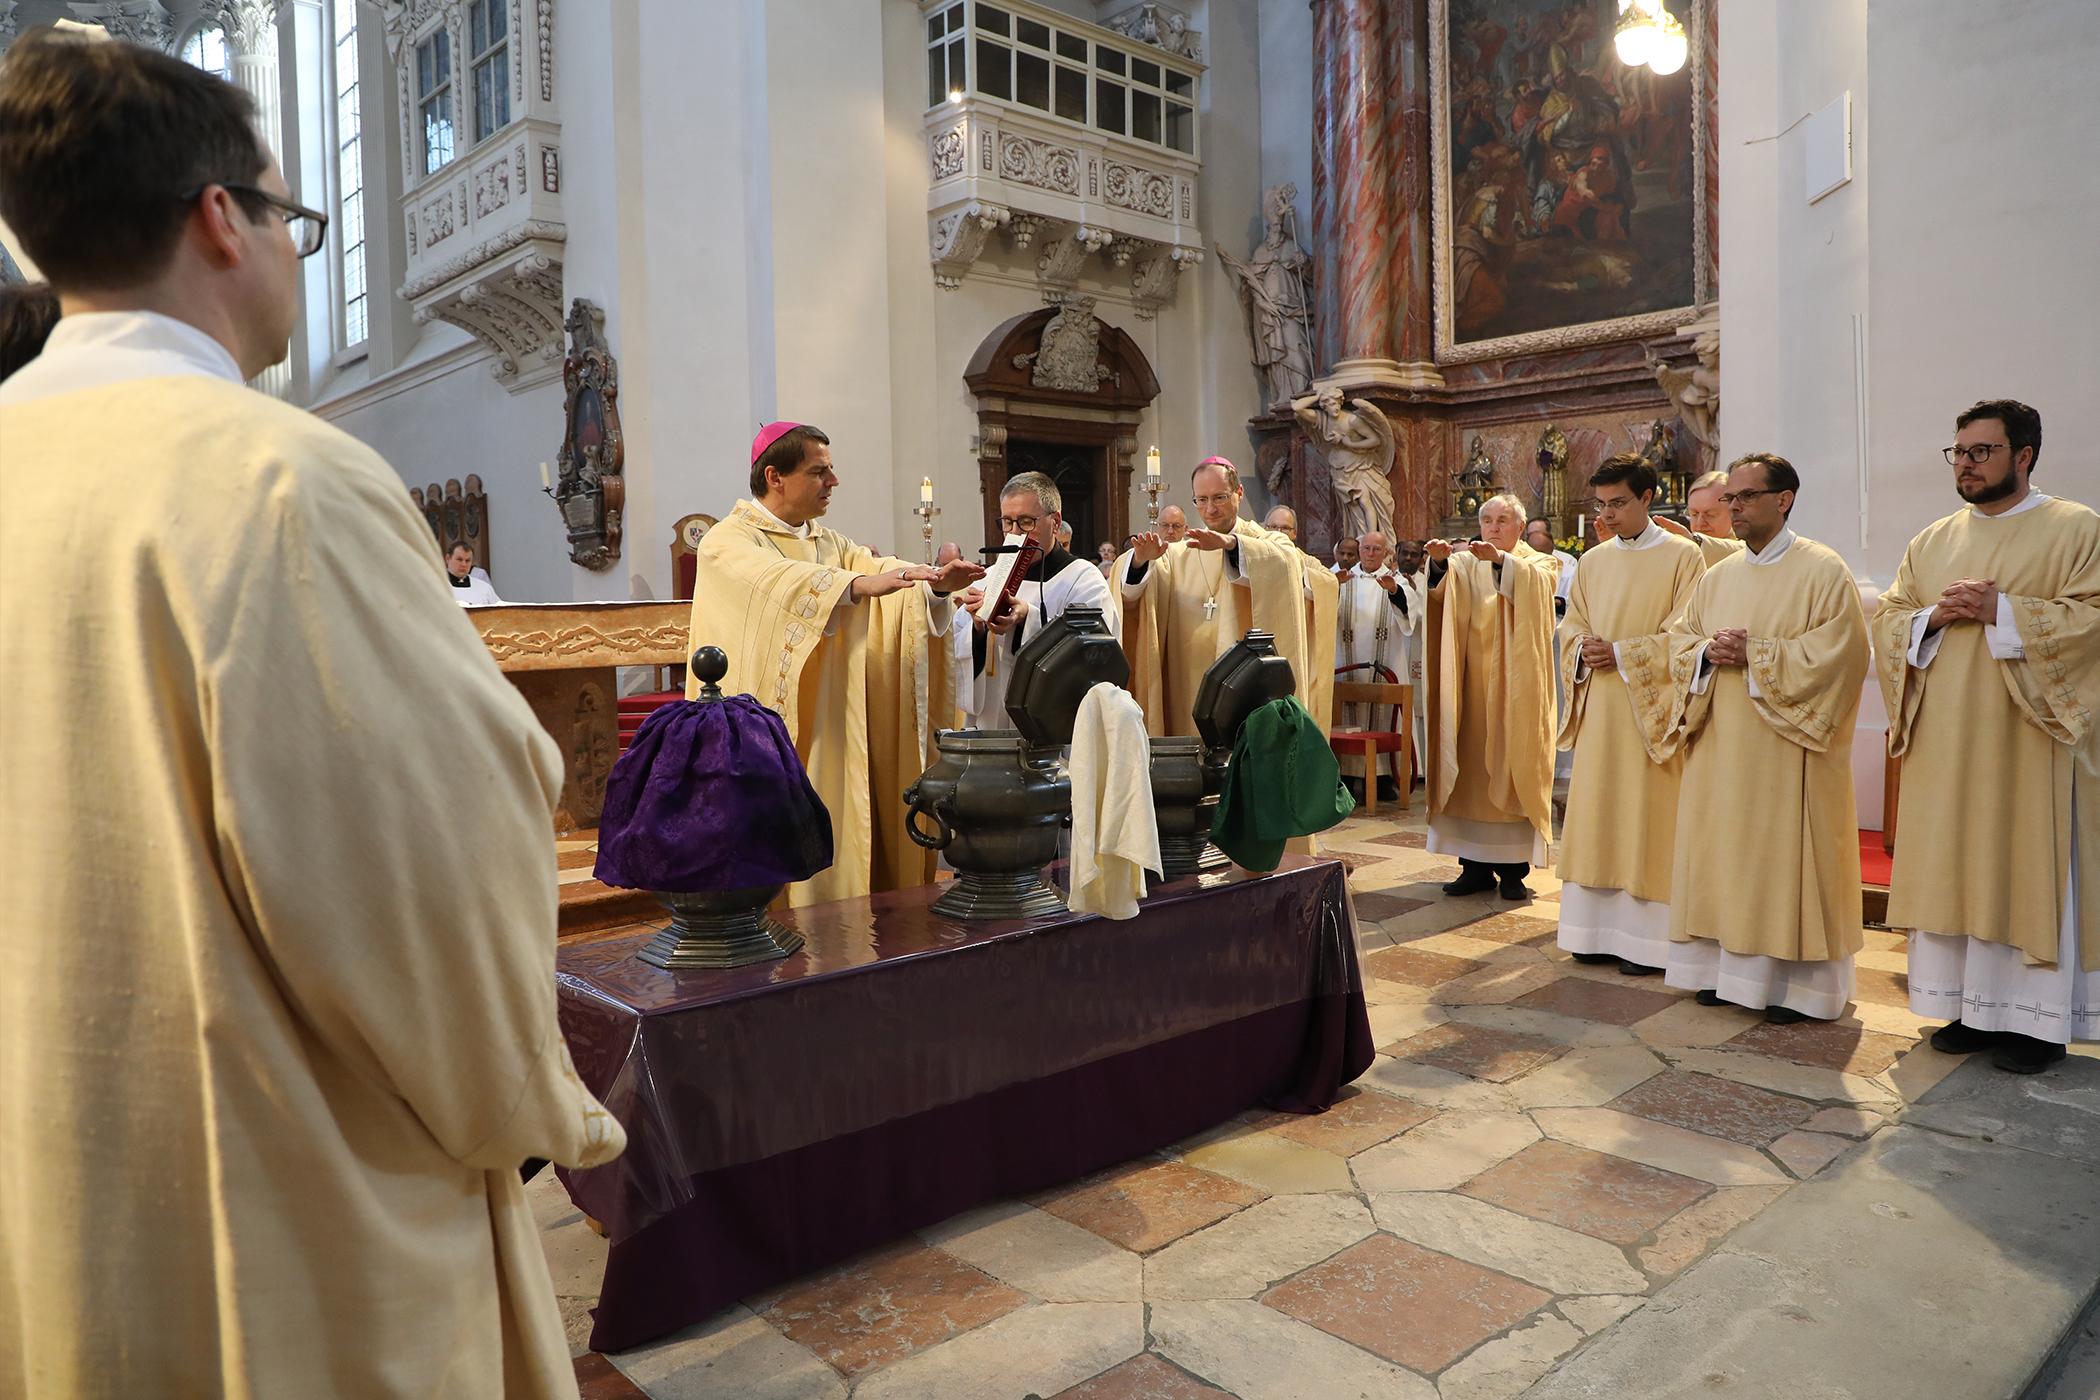 190415_Priesterdiakonentag-Missa-chrismatis_foto6